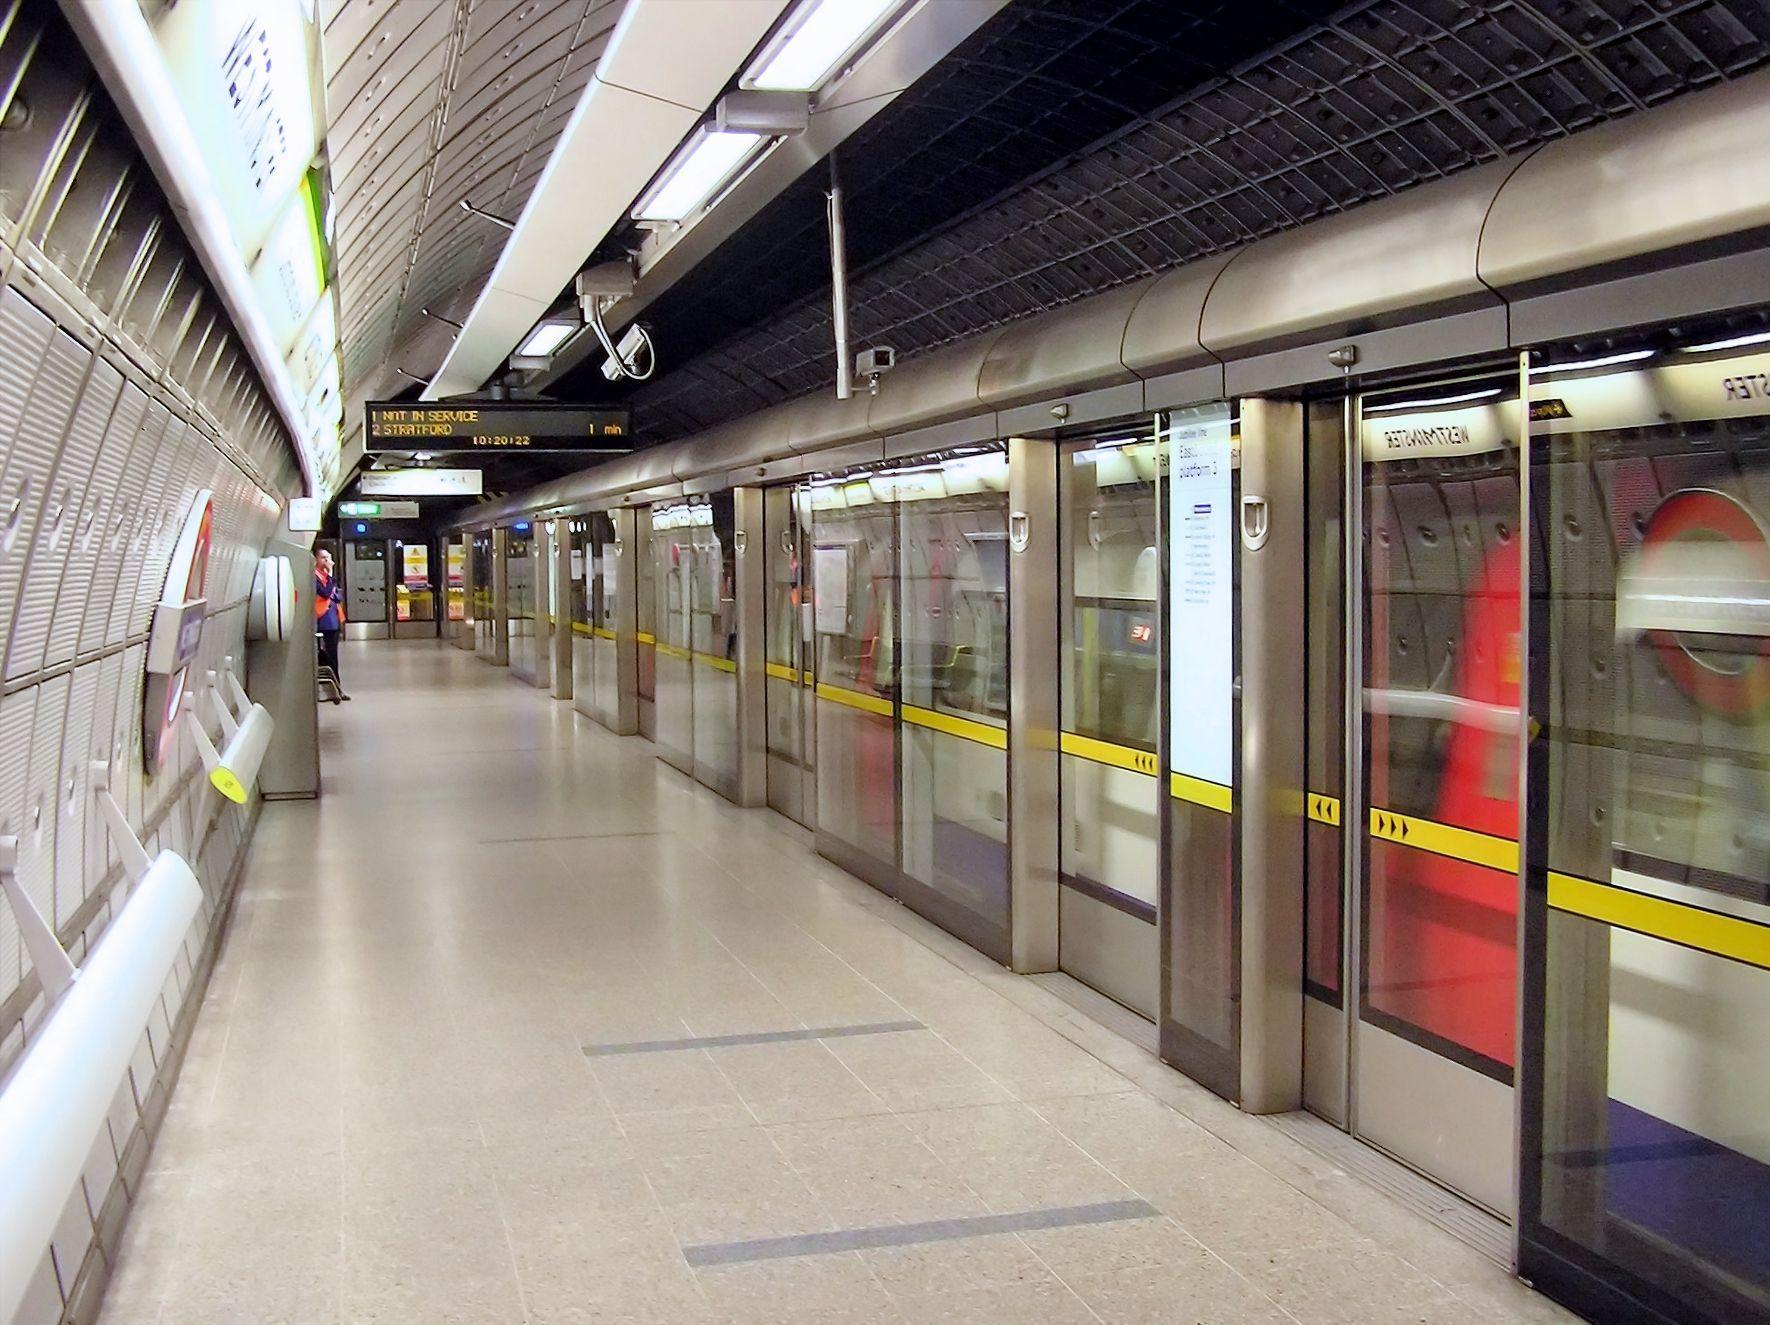 Westminster Tube Station Jubilee Arp Jpg 1770 1325 Trains  # Muebles Peekskill